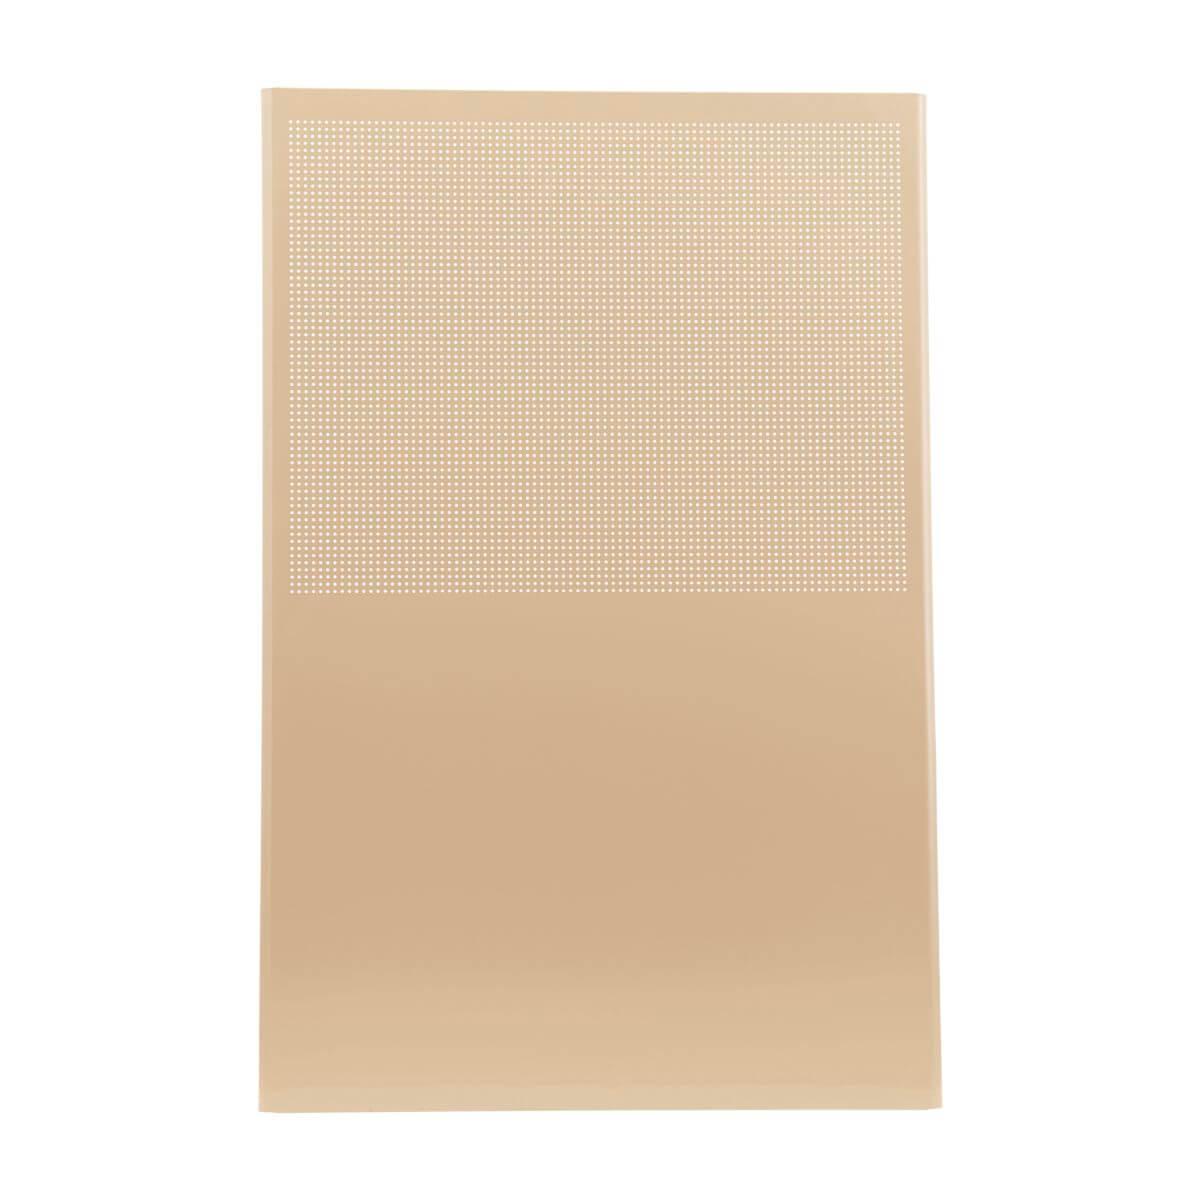 Image of   Monograph Opslagstavle, Grid, Nude, l: 90 cm, b: 60 cm